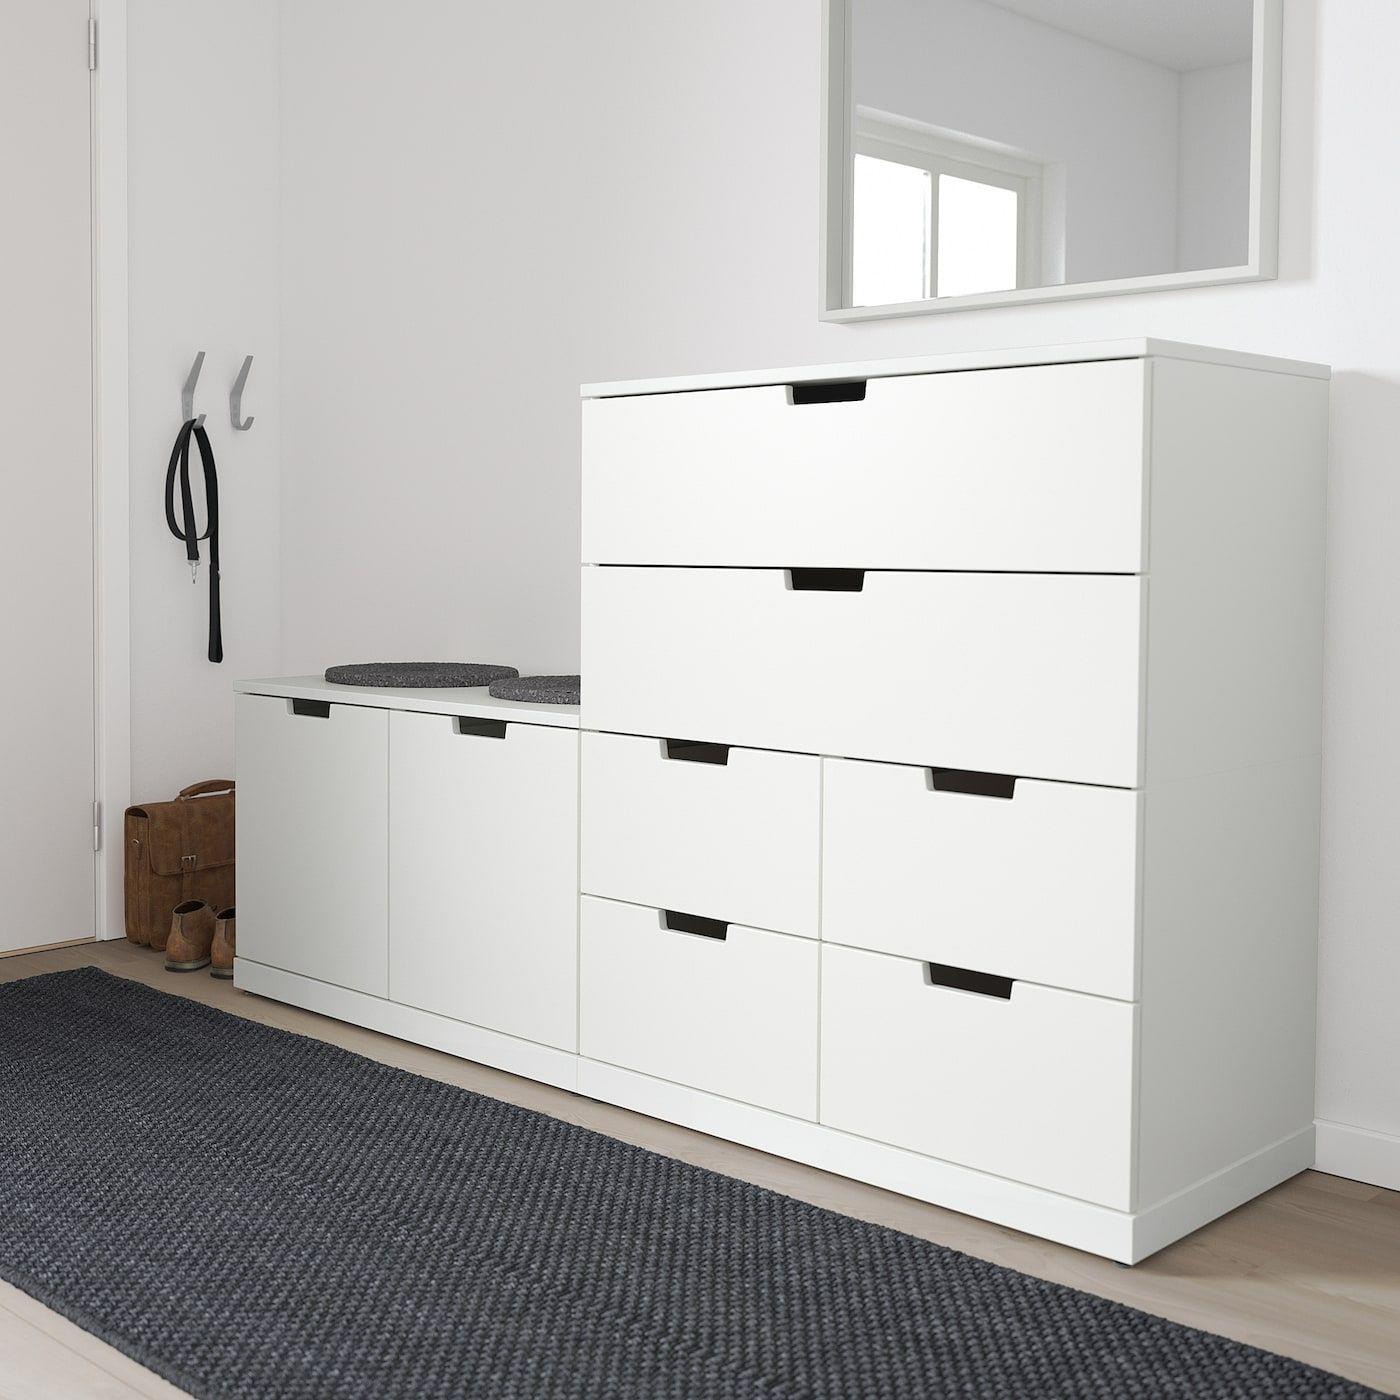 Nordli Chest Of 8 Drawers White Ikea In 2020 Kommode Schubladen Nordli Ikea